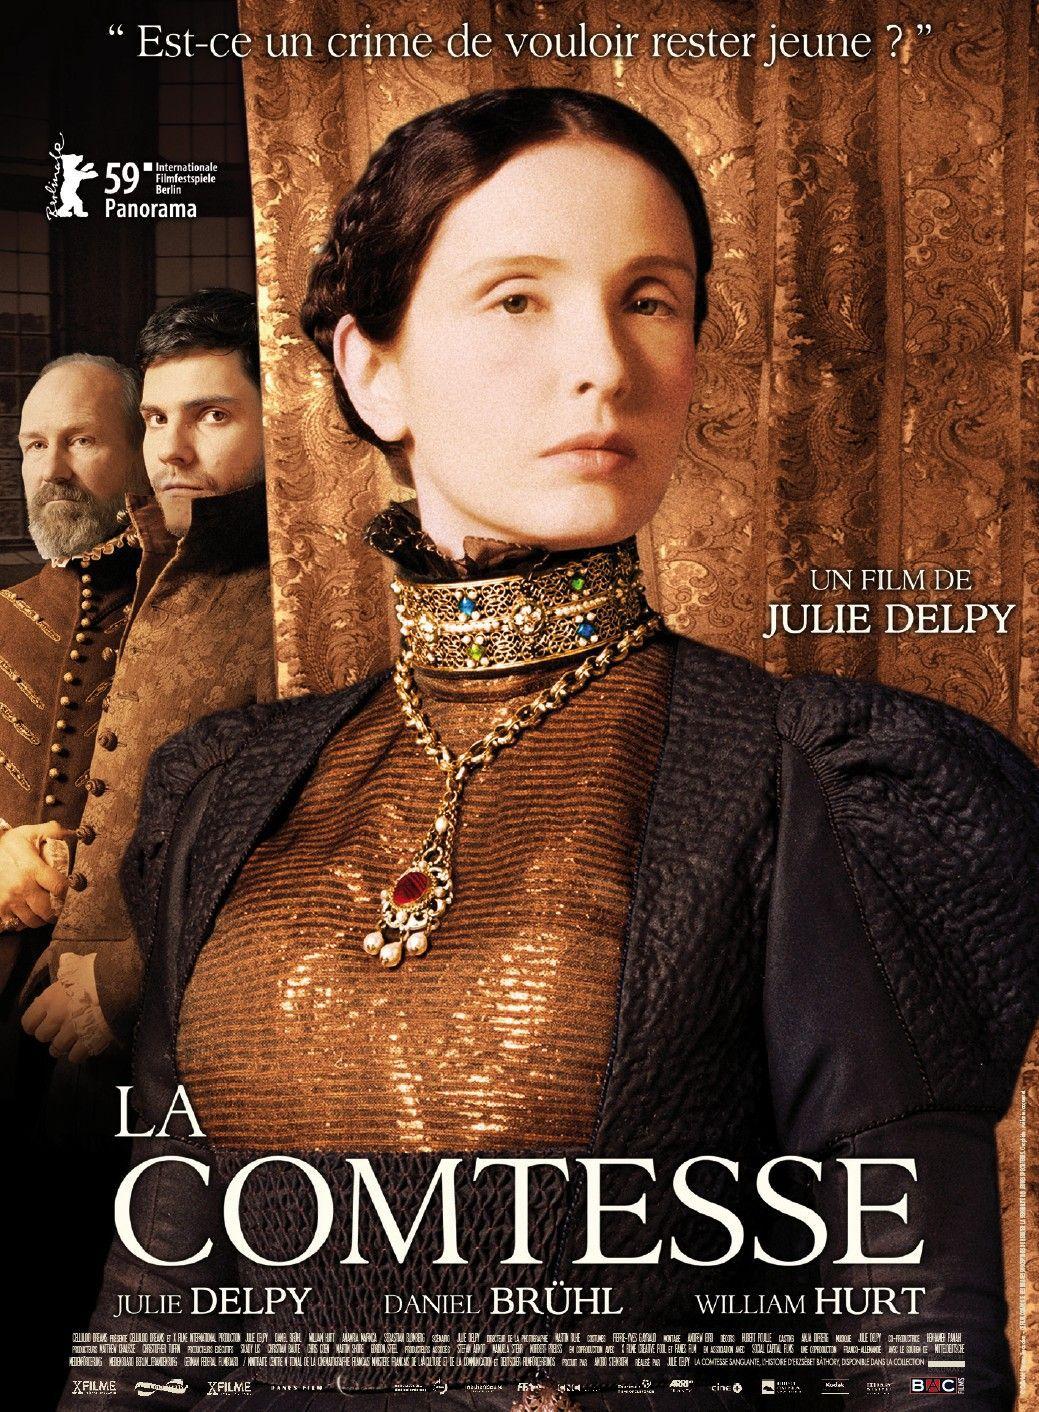 La Comtesse - Film (2010)